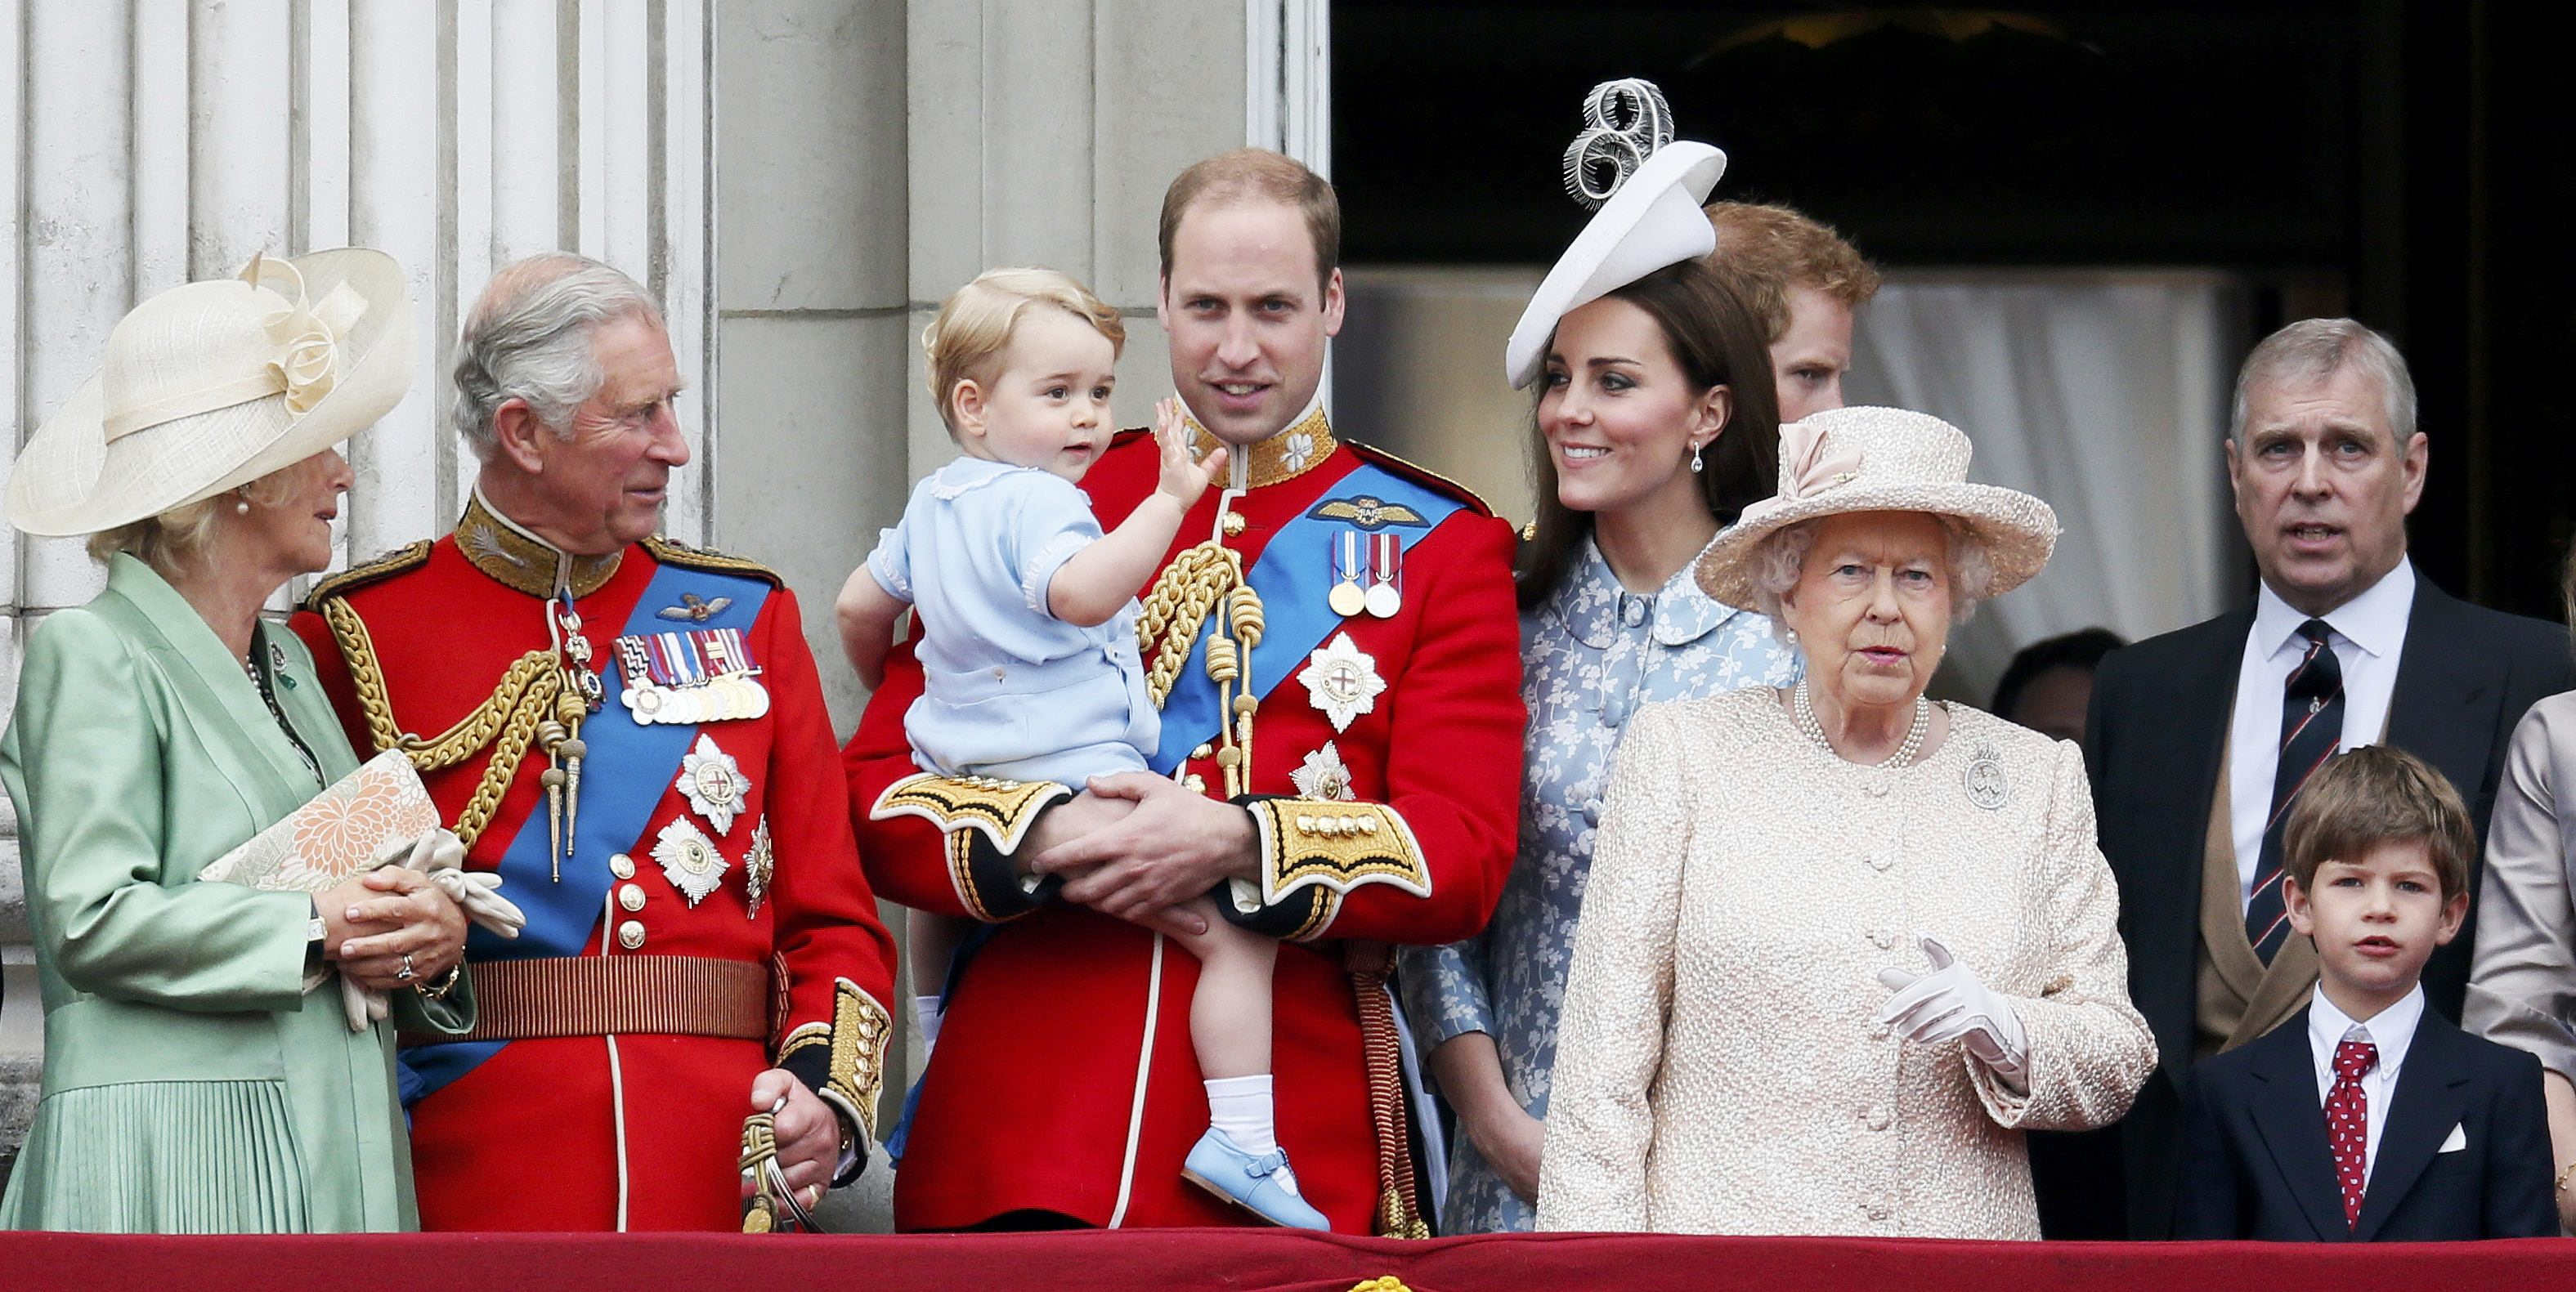 Ratu Inggris Elizabeth (ketiga kanan) bersama Pangeran Charles (kedua kiri), Duchess of Cornwall Camilla (kiri), Pangeran William (keempat kiri), Pangeran George (ketiga kiri), Duchess of Cambridge Catherine (kelima kiri), dan Pangeran Andrew berdiri di atas balkon Istana Buckingham setelah menghadiri upacara Trooping the colour di Lapangan Parade Pasukan Berkuda di London, Inggris, Sabtu (13/6). Trooping the Colour merupakan upacara untuk memperingati hari ulang tahun Ratu Elizabeth. ANTARA FOTO/REUTERS/Stefan Wermuth.